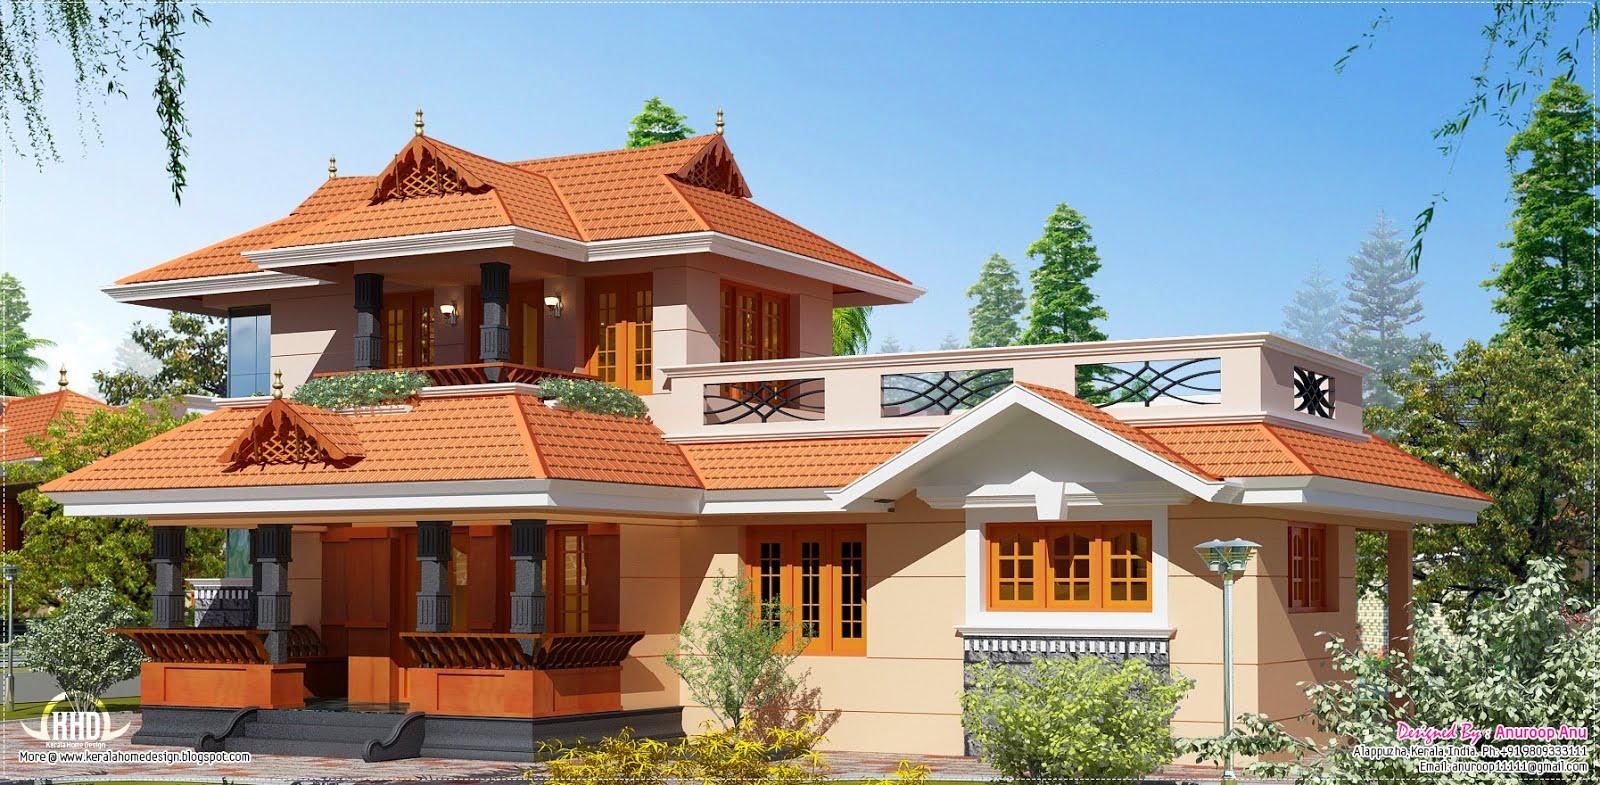 1950 square feet kerala model home kerala home design for Kerala model house plans 1500 sq ft